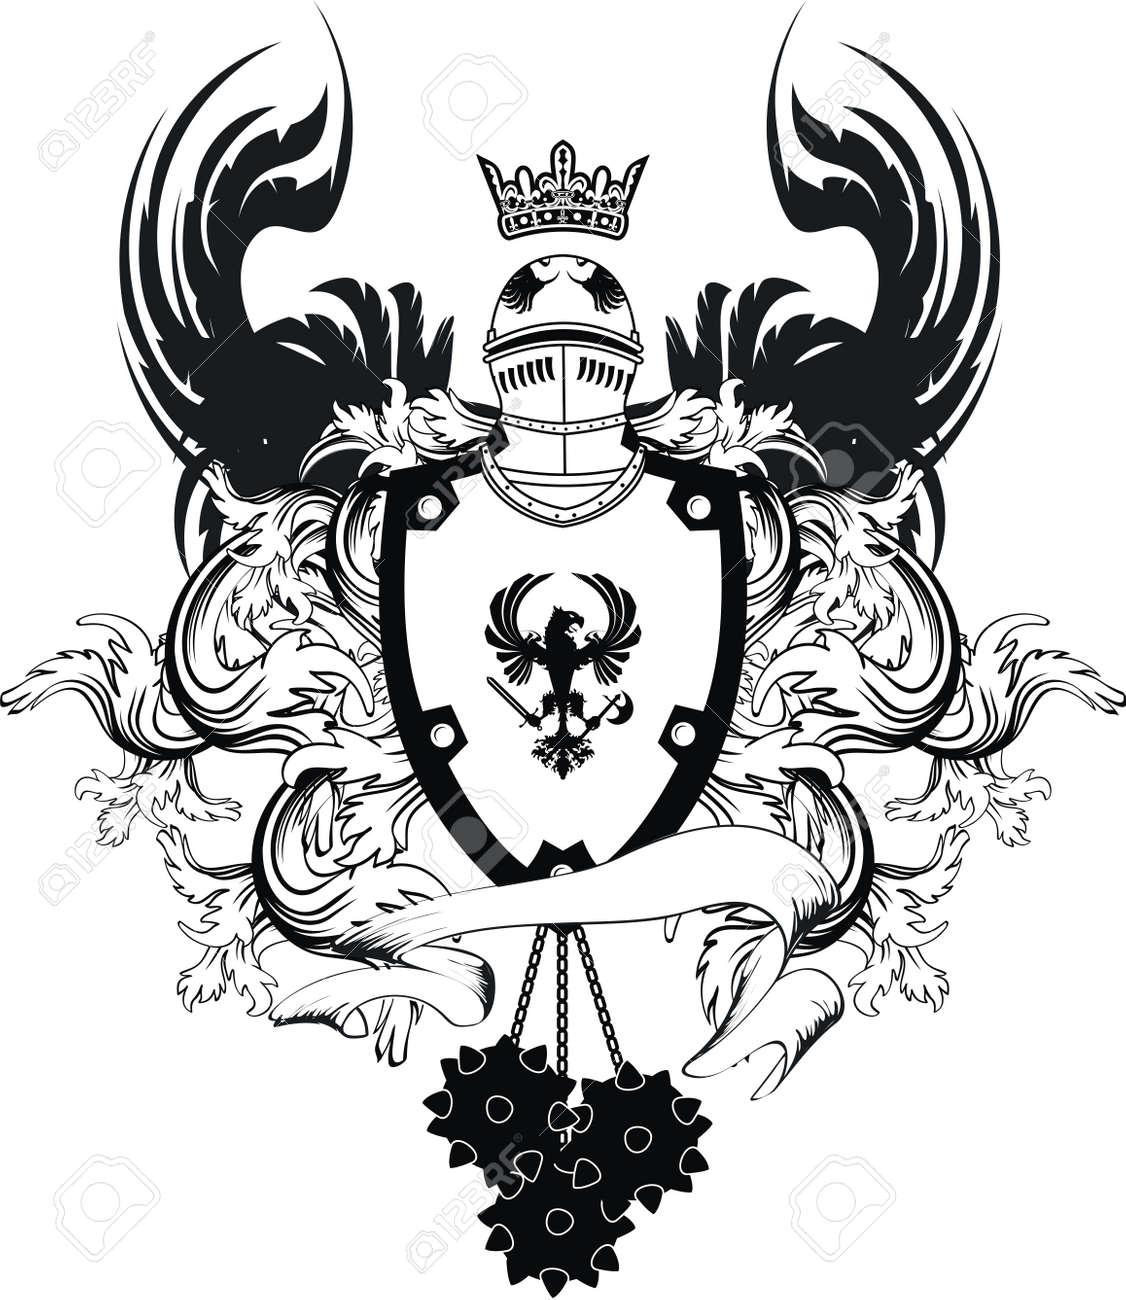 heraldic helmet coat of arms in vector format royalty free cliparts rh 123rf com ontario coat of arms vector coat of arms vector pack